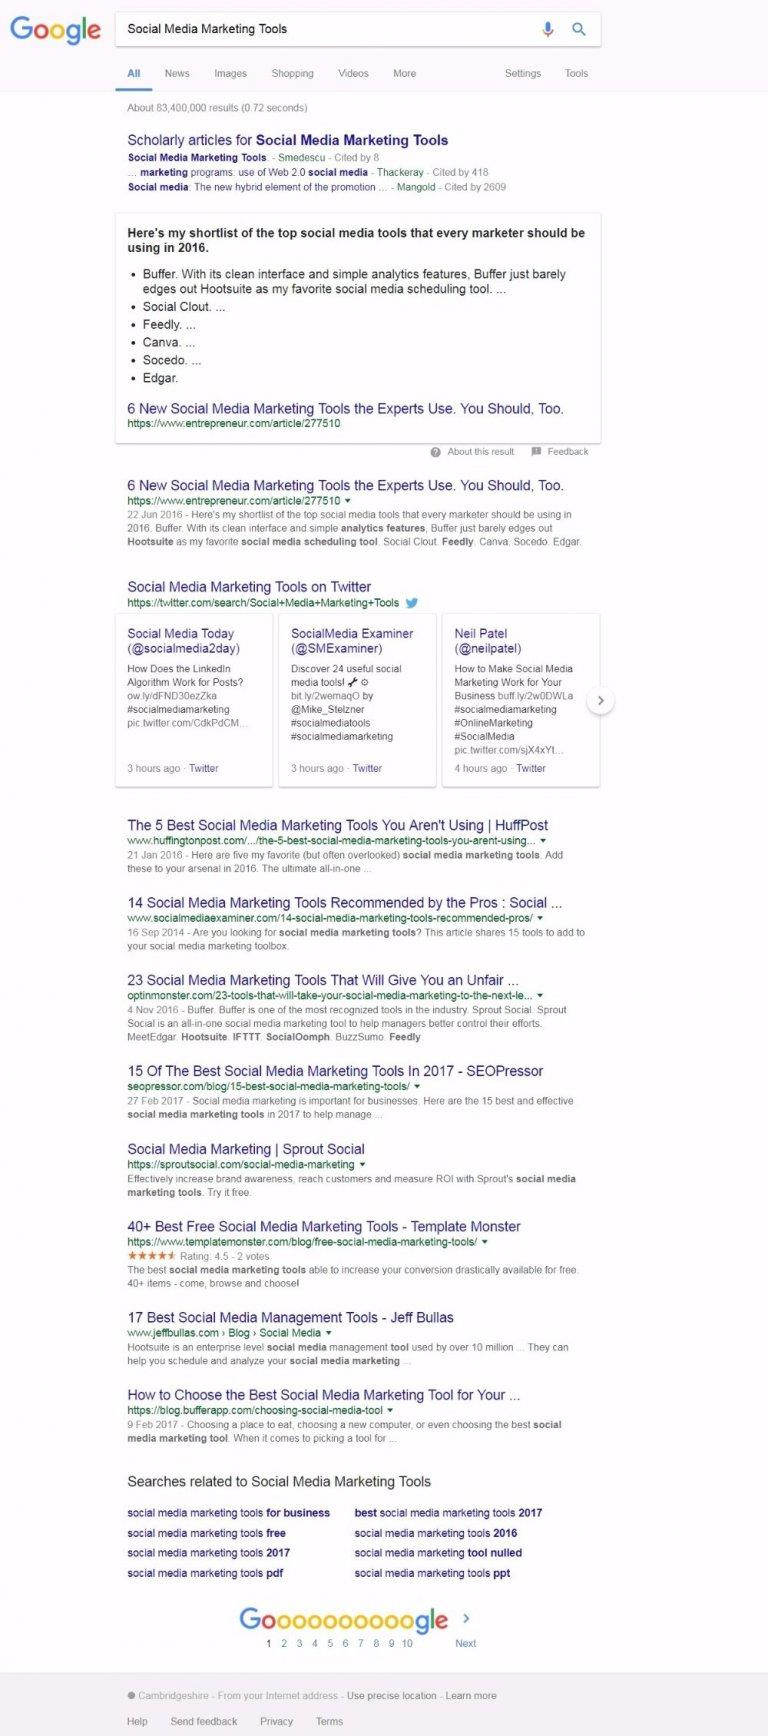 Social Media Marketing Tools Google Search